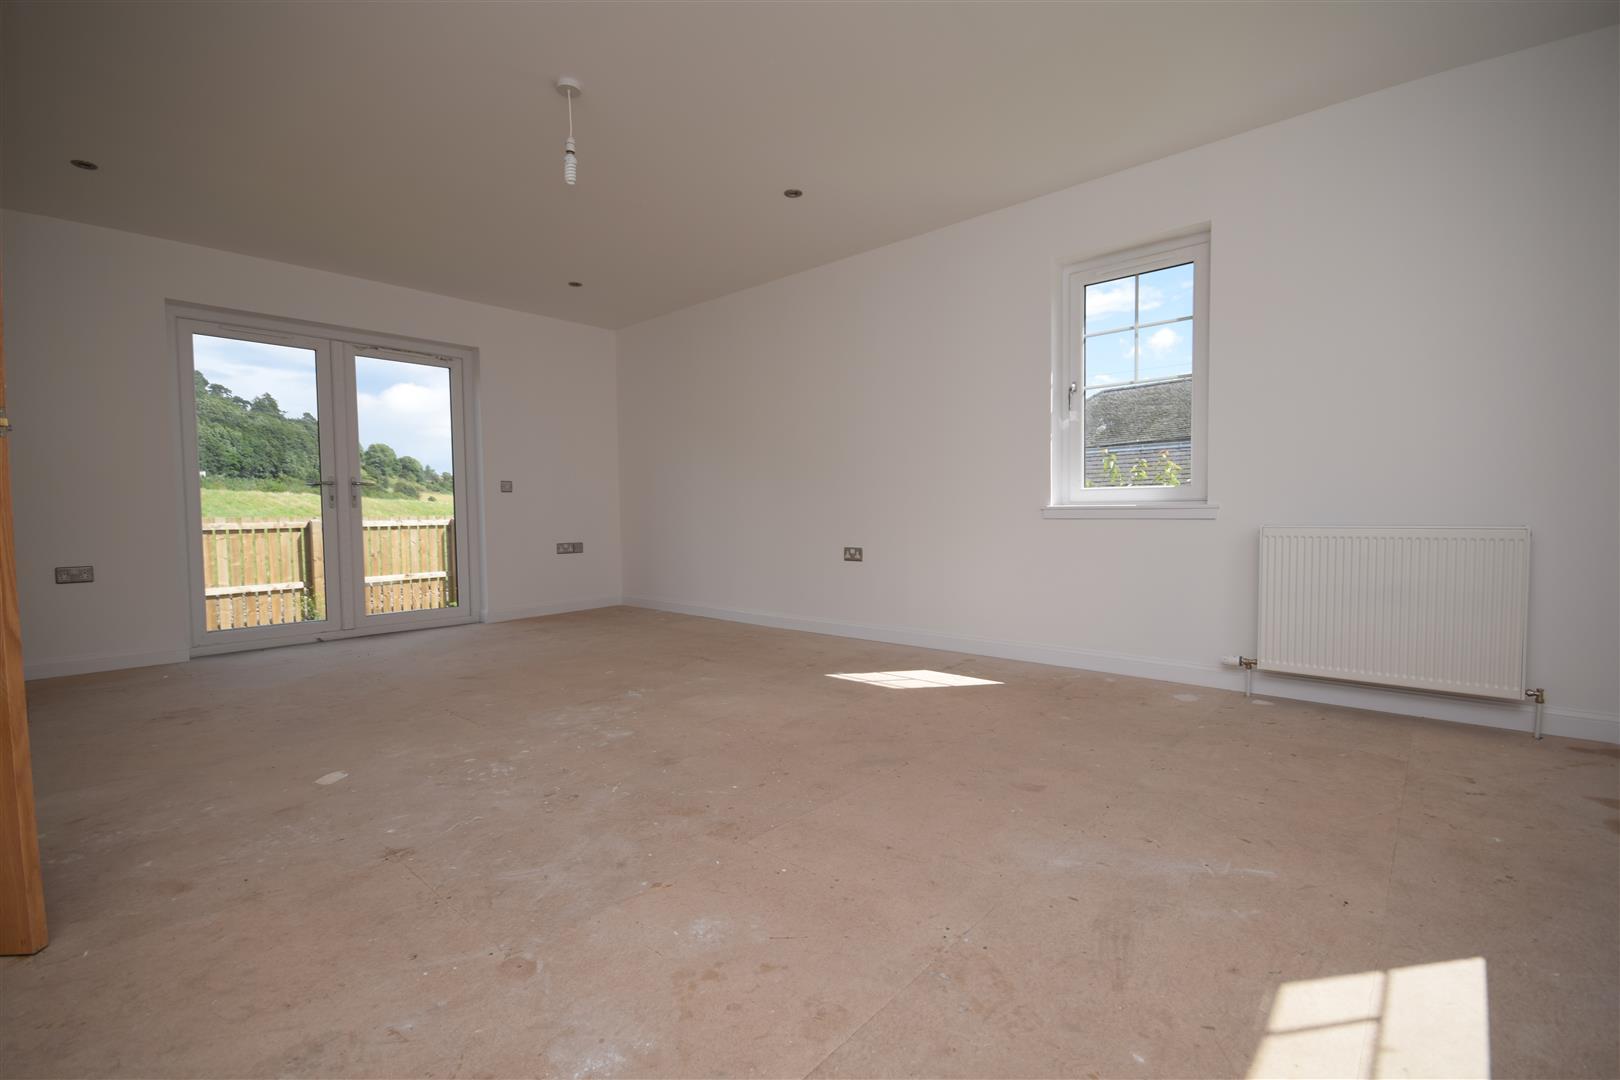 The Steadings, Plot 4, New Development, Abernyte, Perth, Perthshire, PH14 9ST, UK